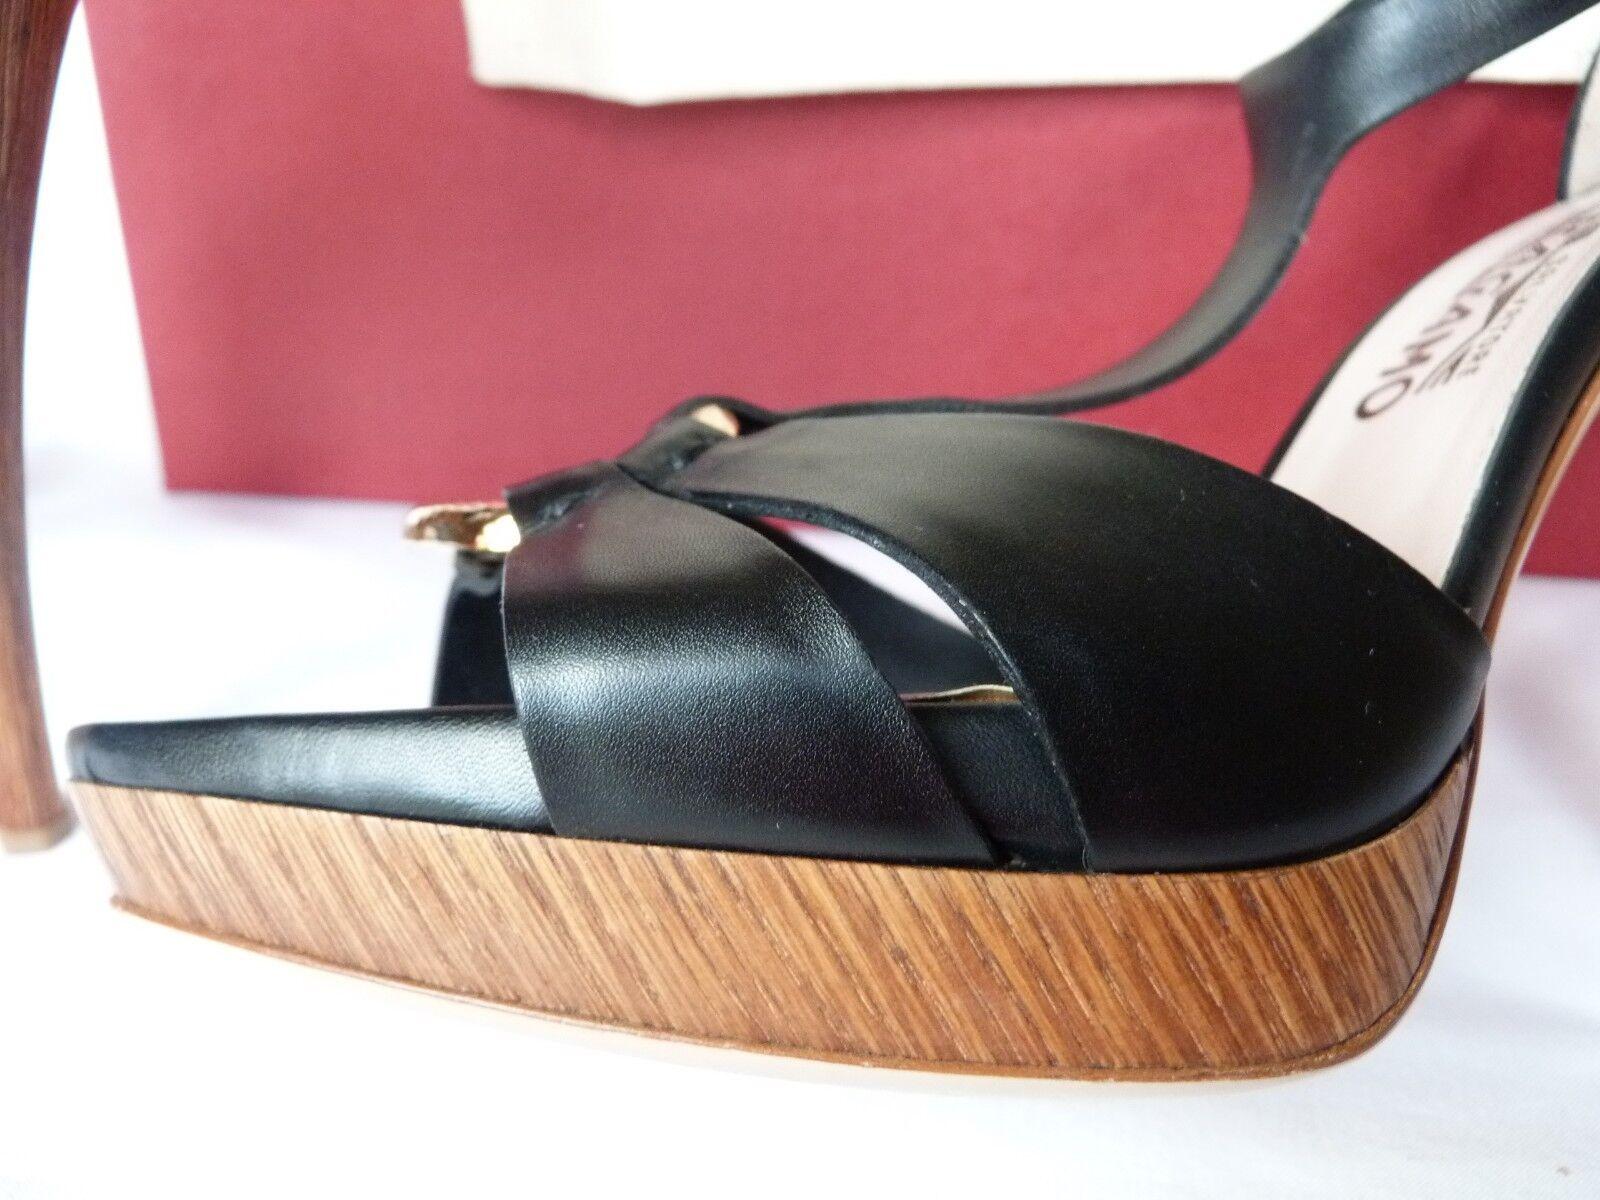 En Caja Salvatore Ferragamo Plataforma Negro Cuero T Bar Plataforma Ferragamo Tacones Talla 8.5 Reino Unido 6 2ffcb0